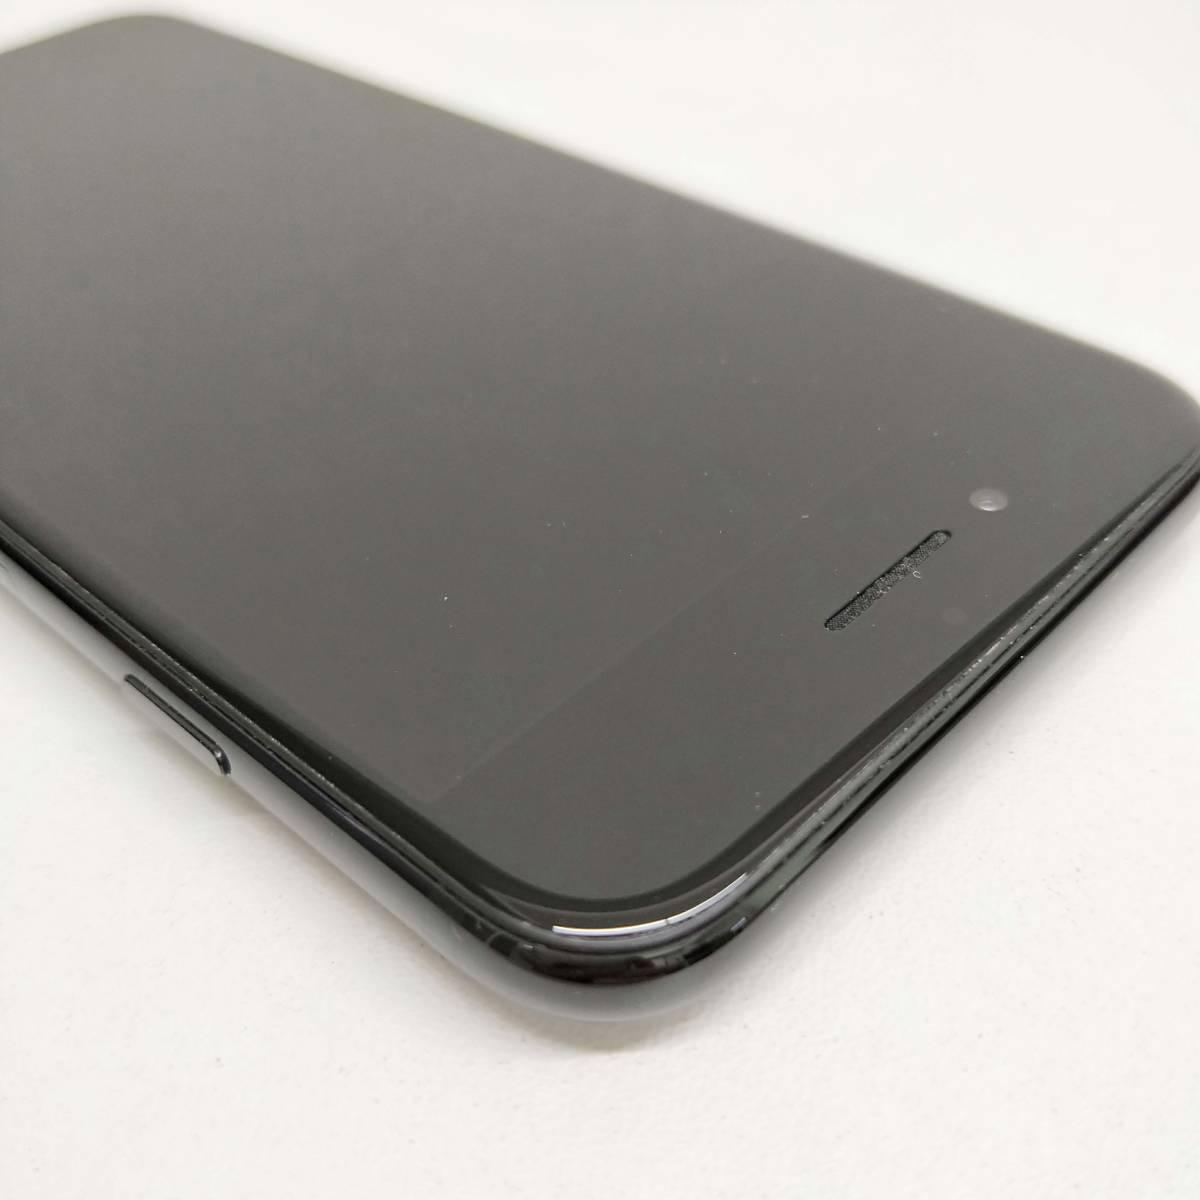 SIMフリー iPhone 7 128GB Jet Black 美品 バッテリー85% <本体のみ> #051_画像6